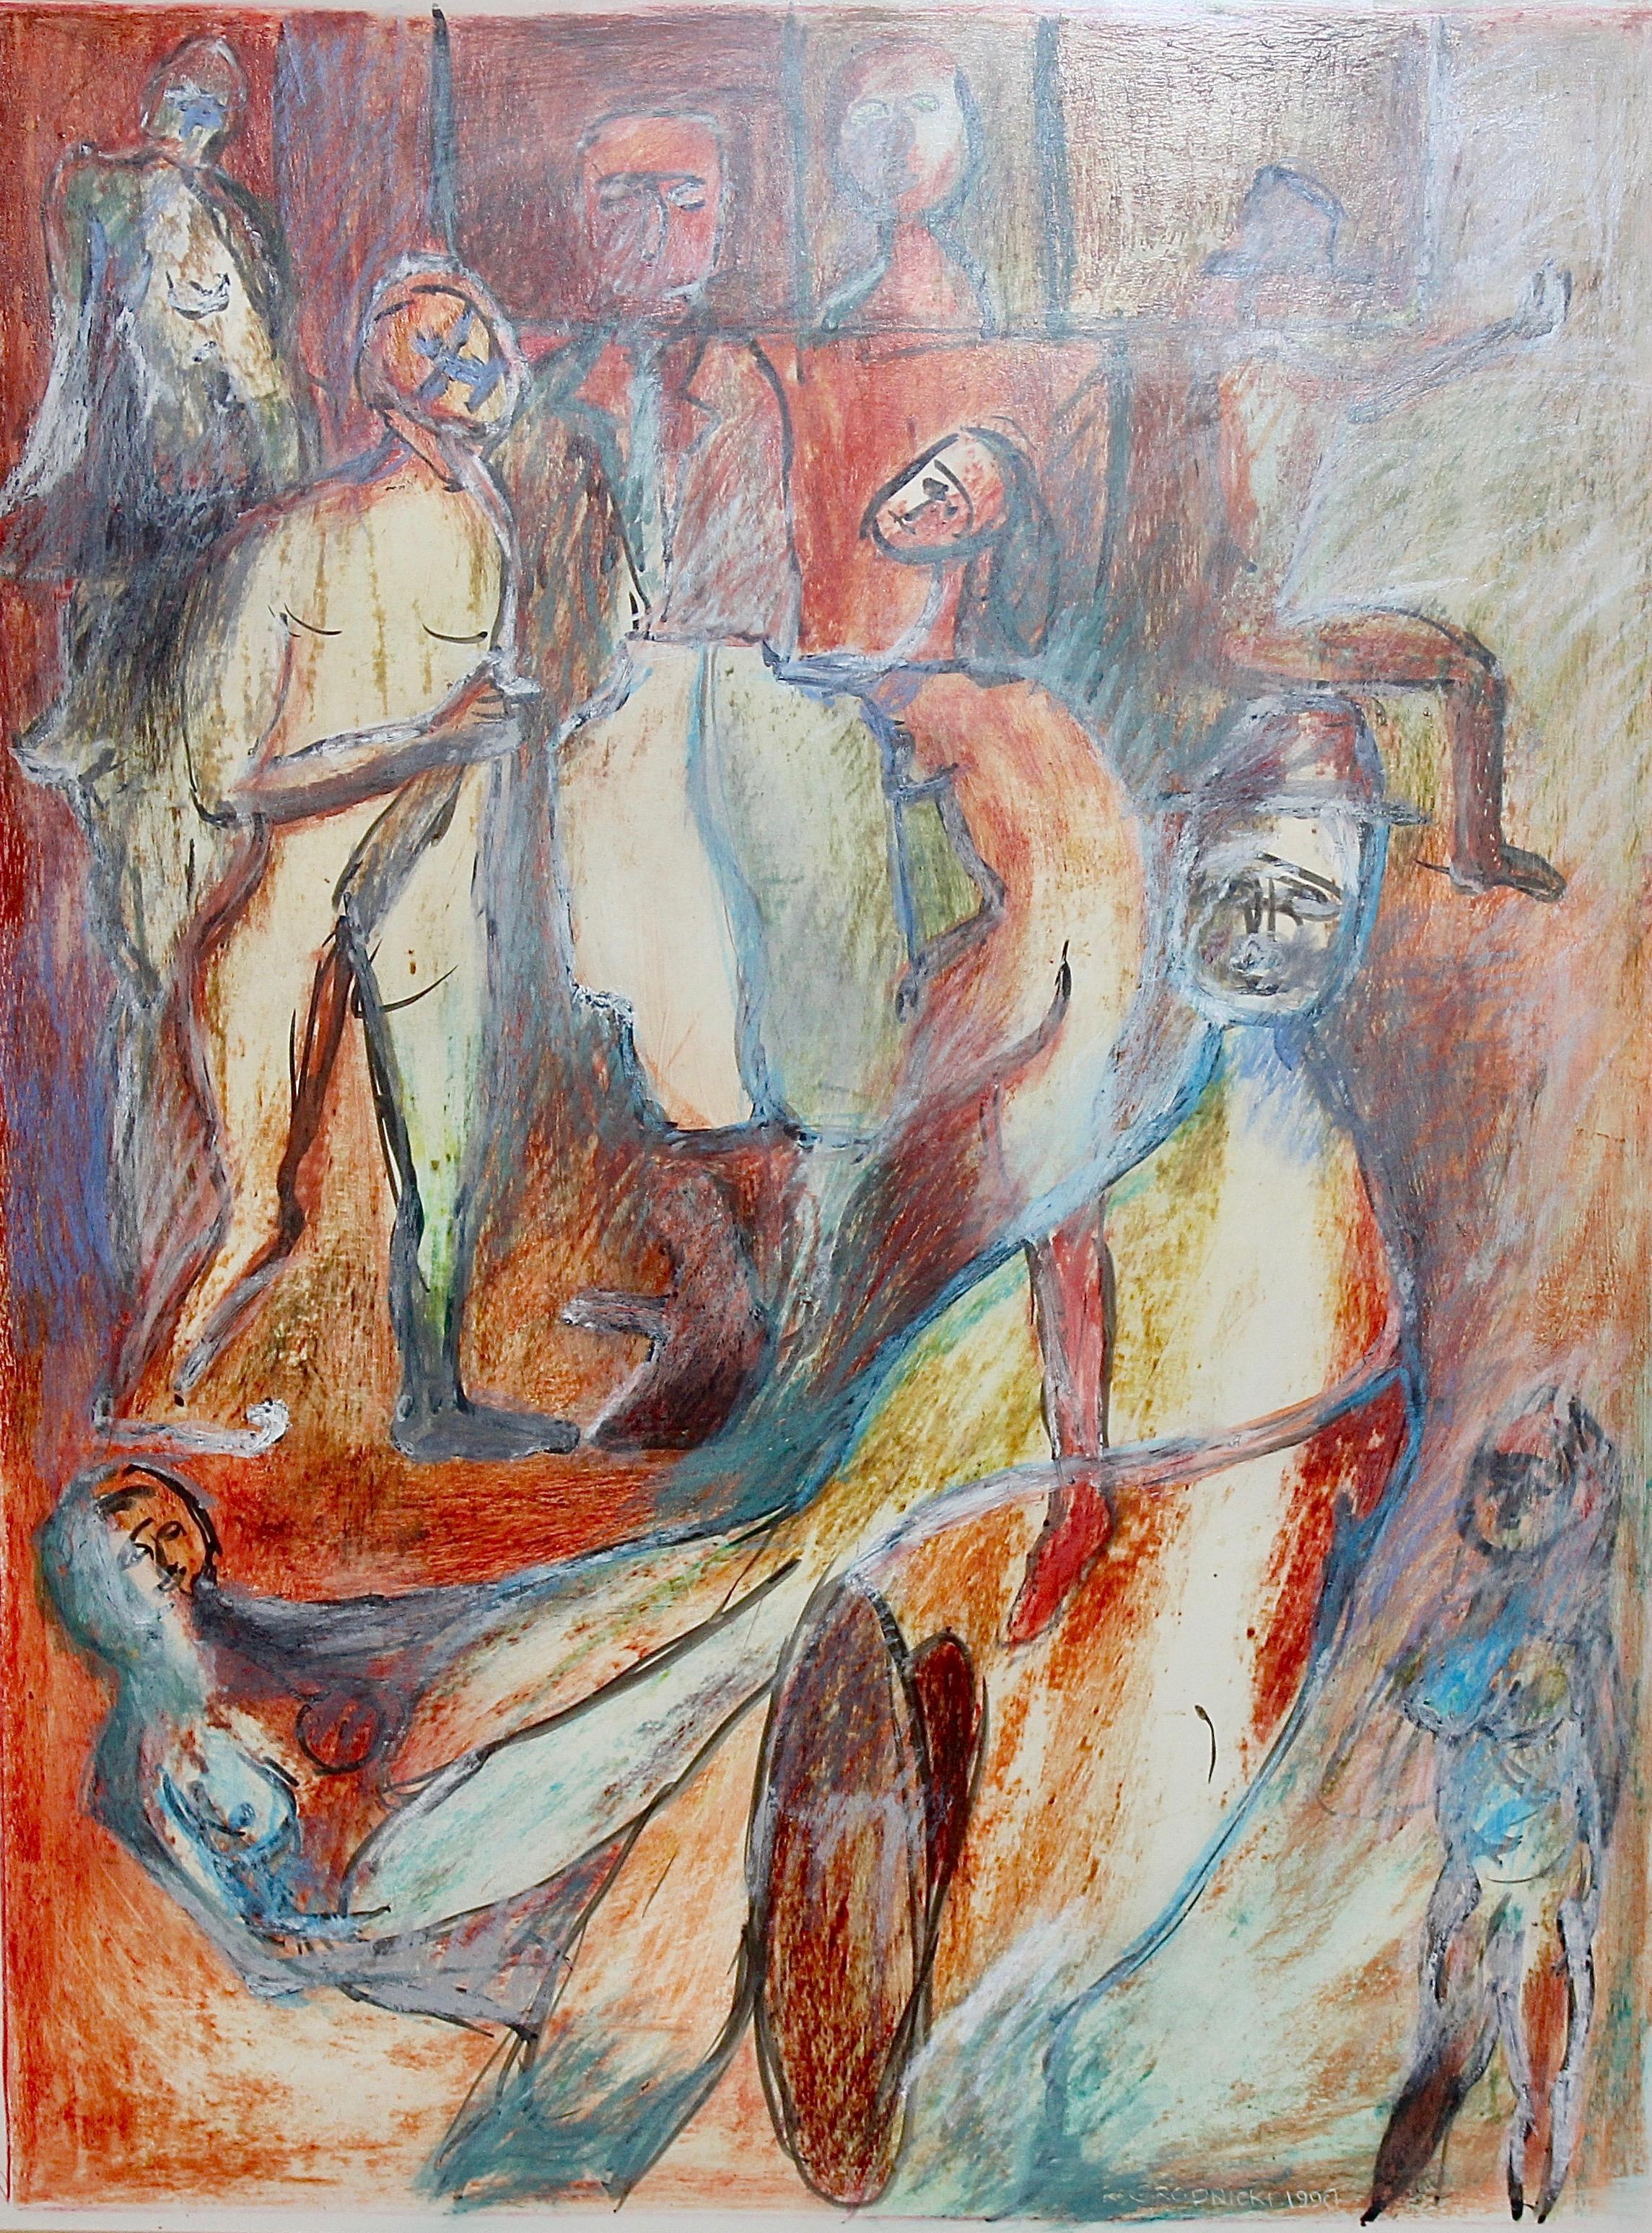 RYSZARD GRODNICKI, original Abstract painting, acrylic colors.